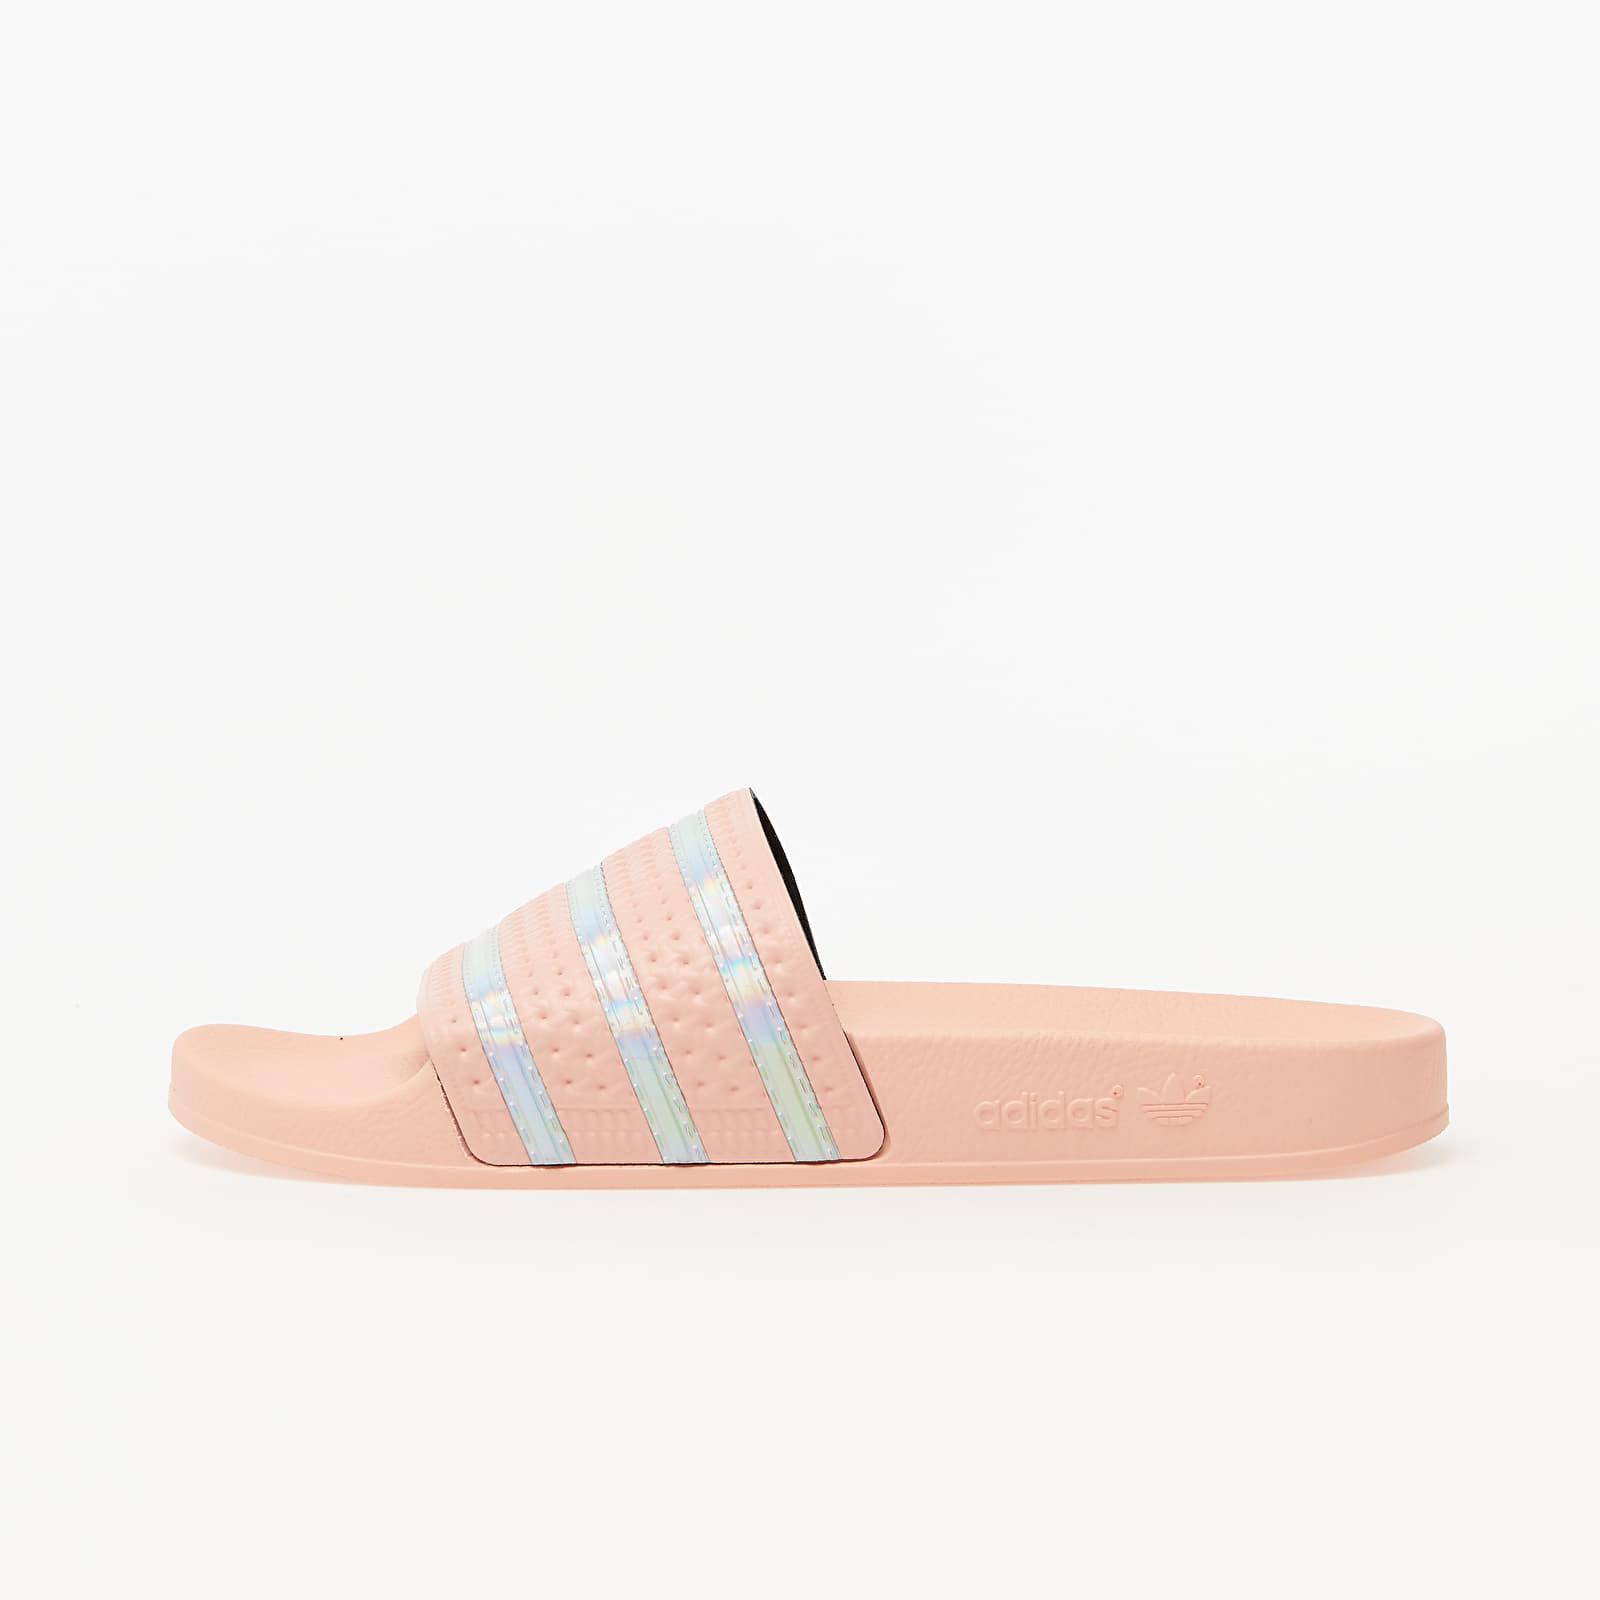 adidas Adilette W Haze Coral/ Ftw White/ Haze Coral EUR 38